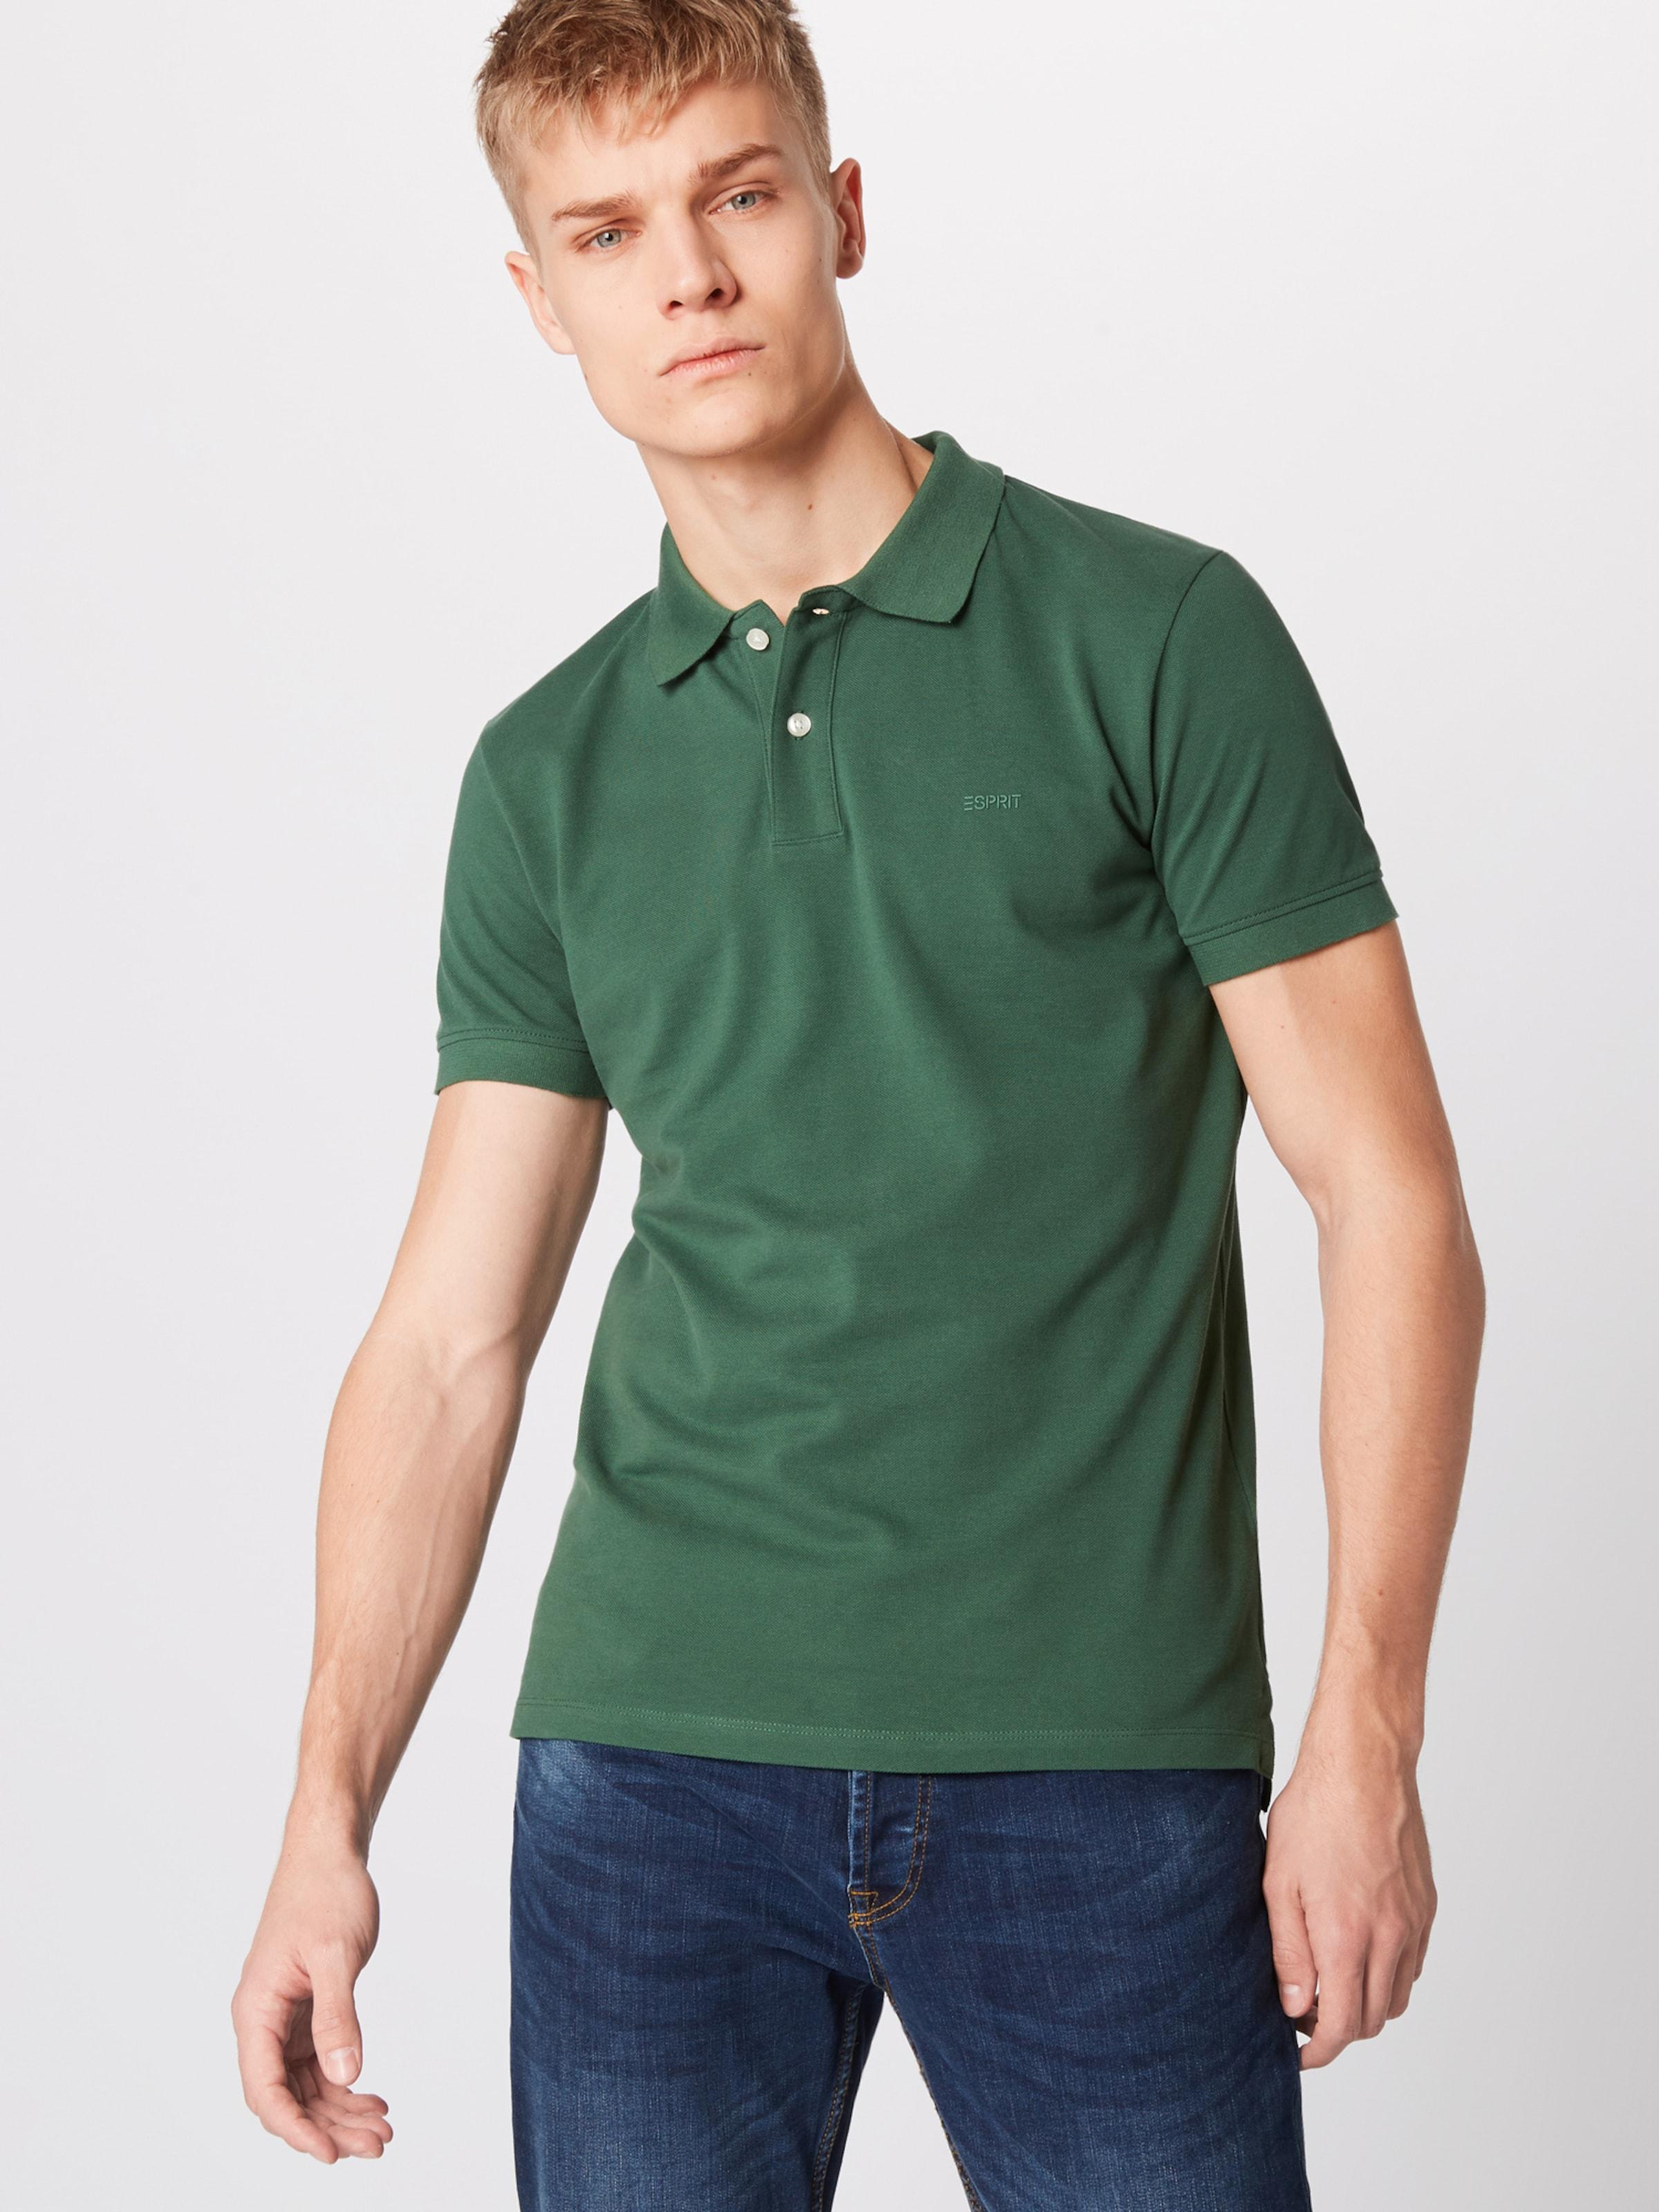 T shirt Esprit shirt En Vert T Esprit uTZOPkXi